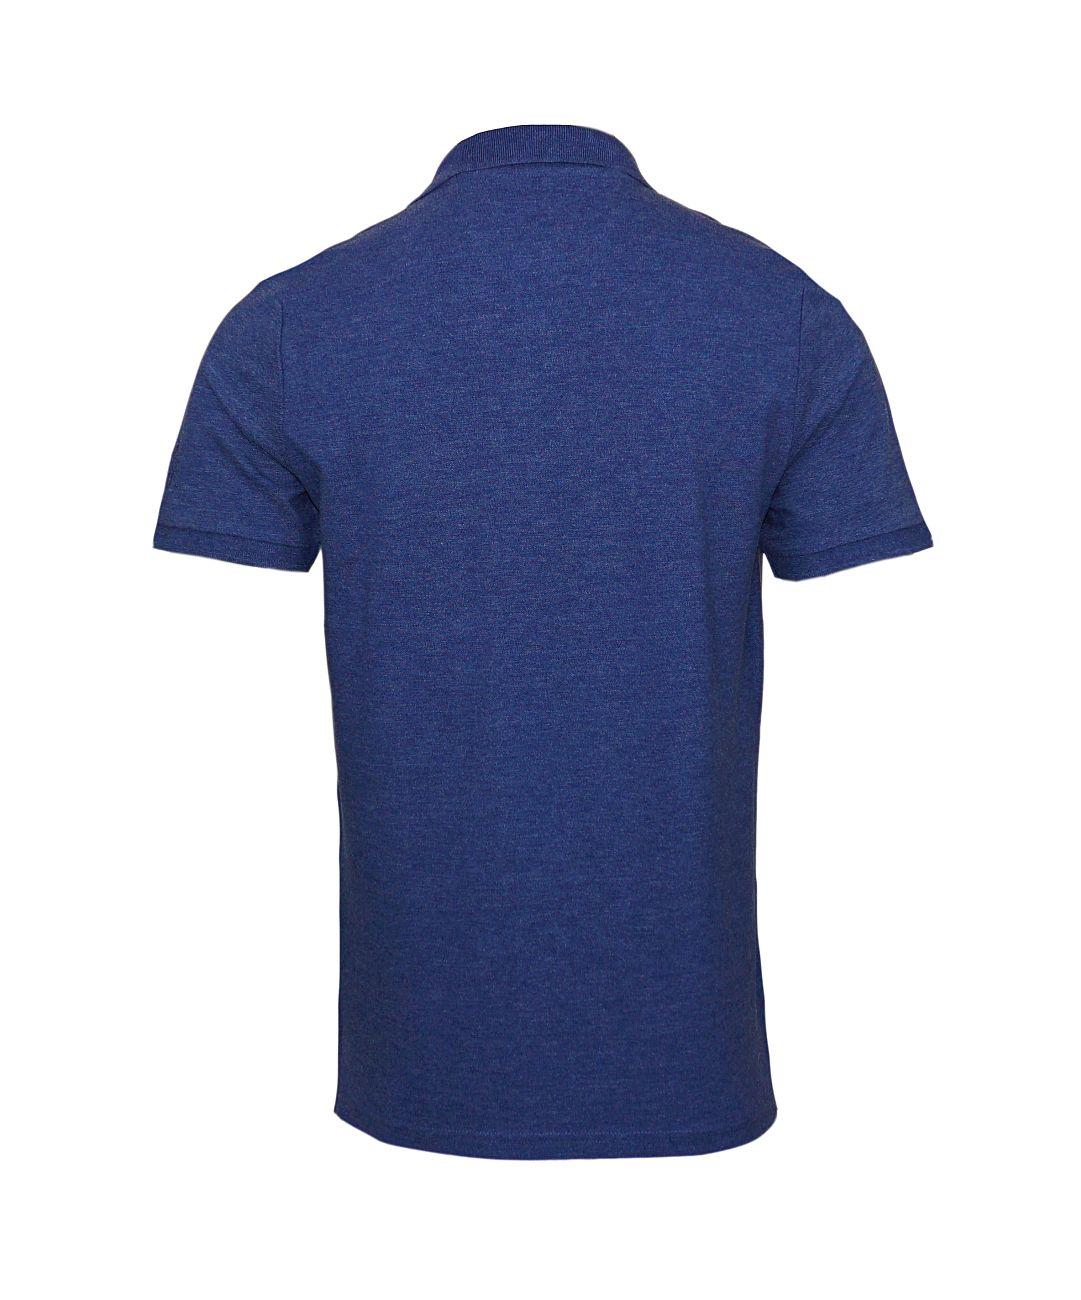 Daniel Hechter Poloshirt Polohemd 75021 181921 670 blau F18-DHP1